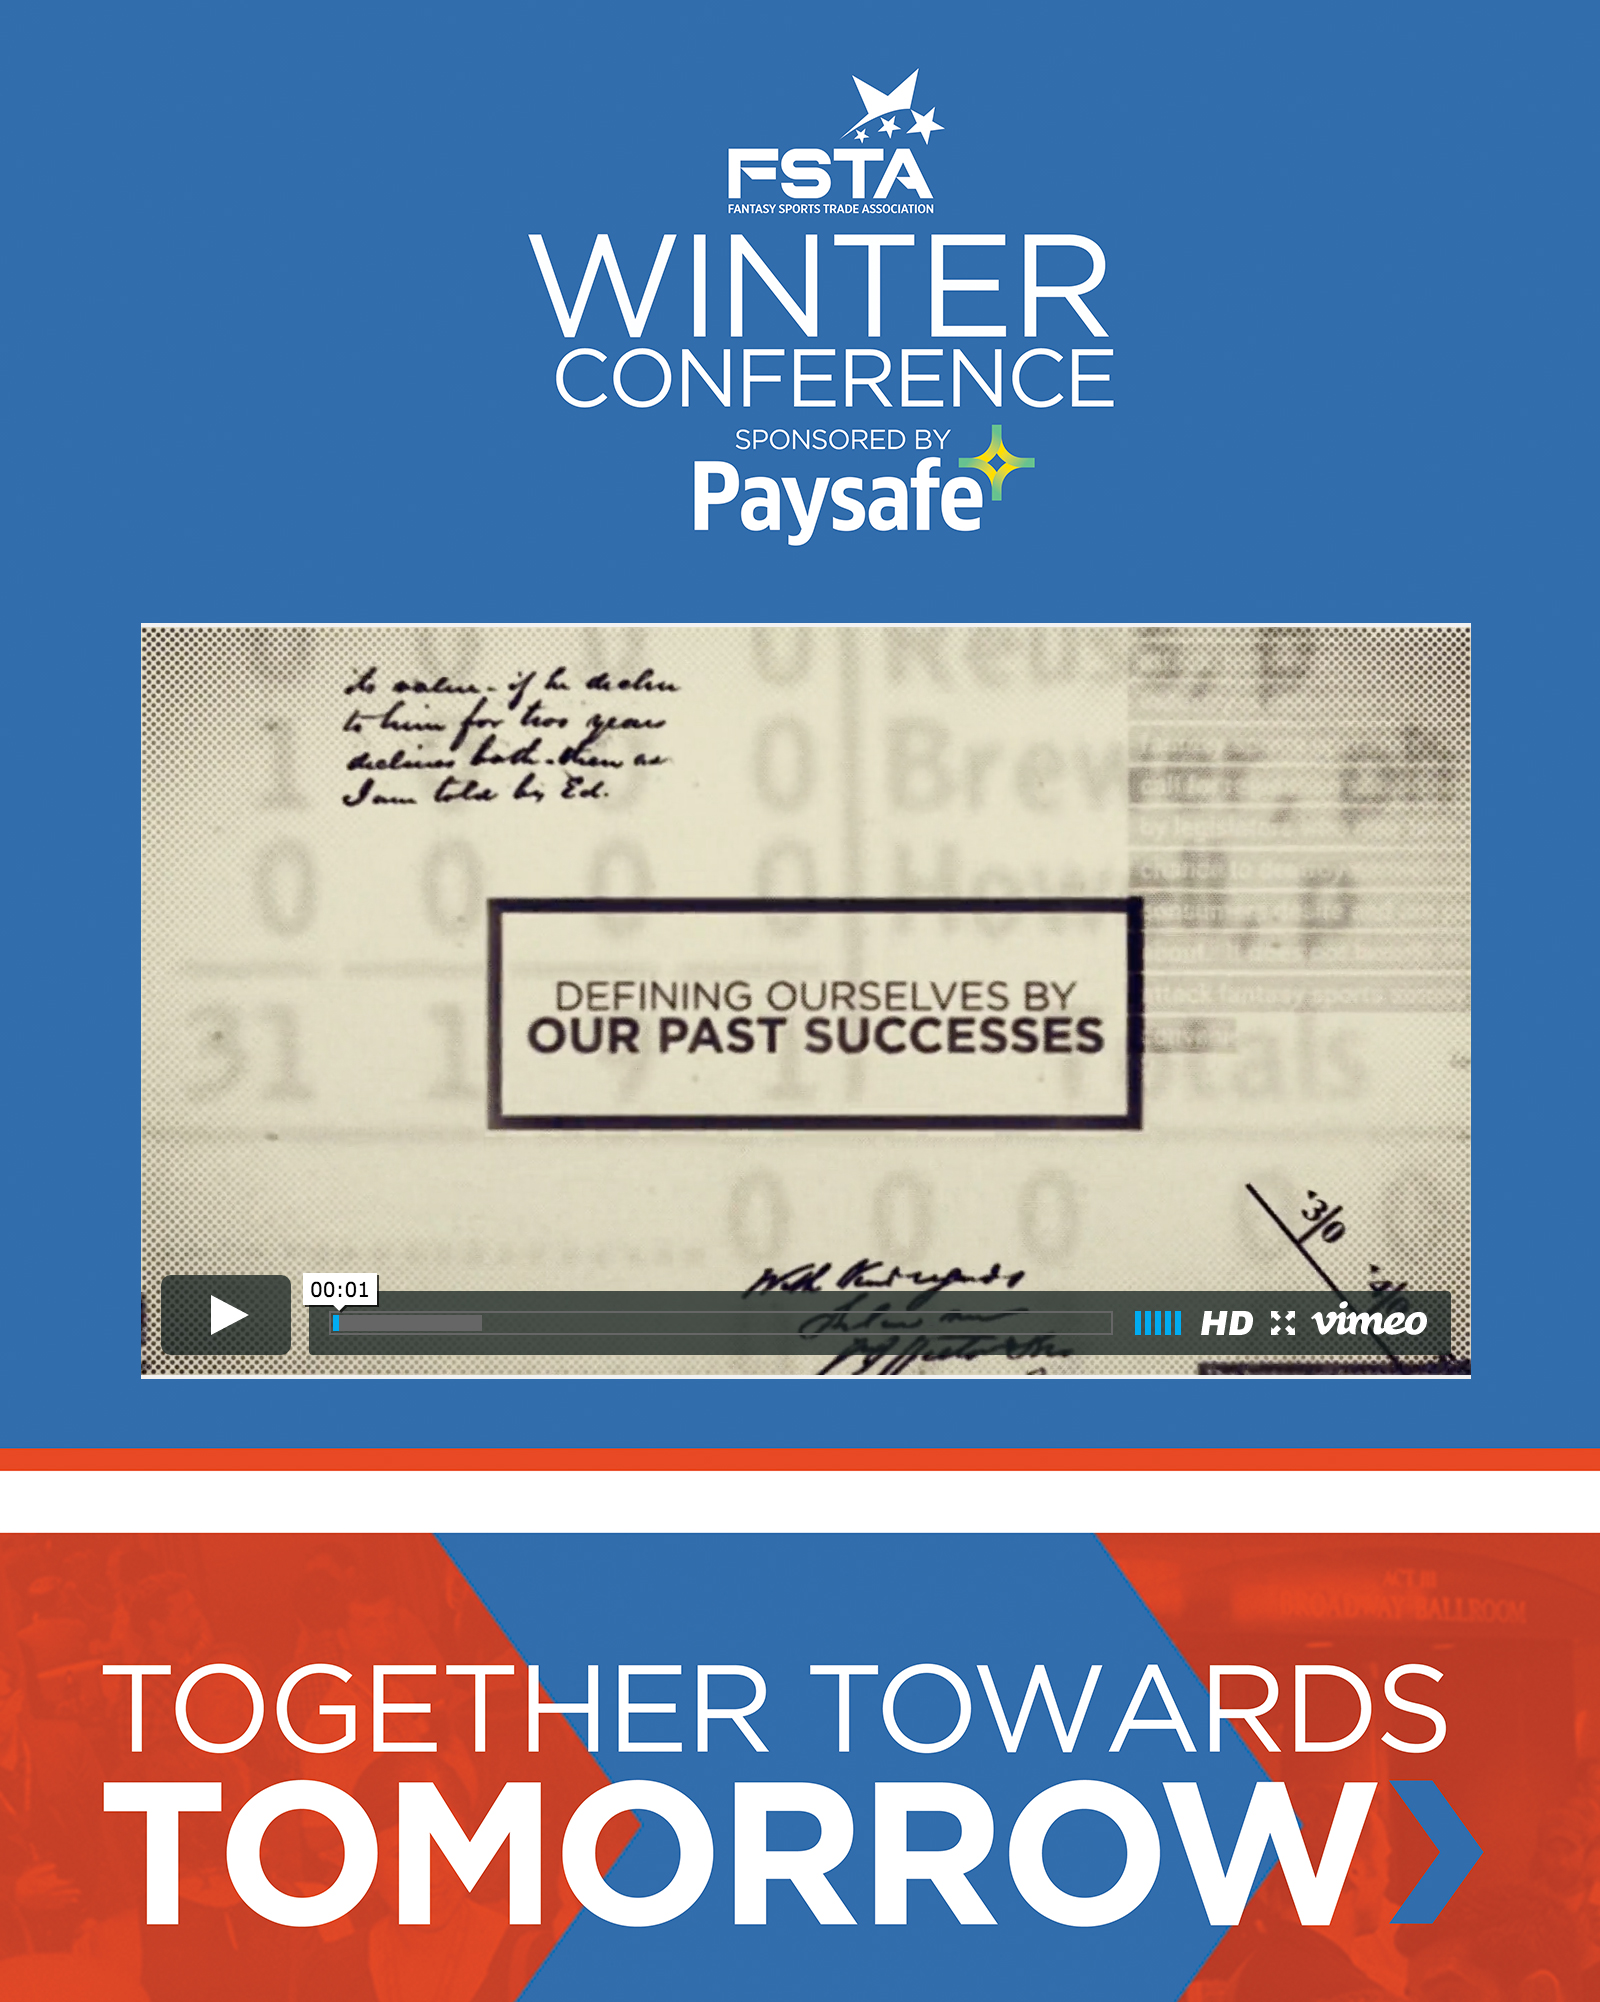 2016 FSTA Winter Conference Opener